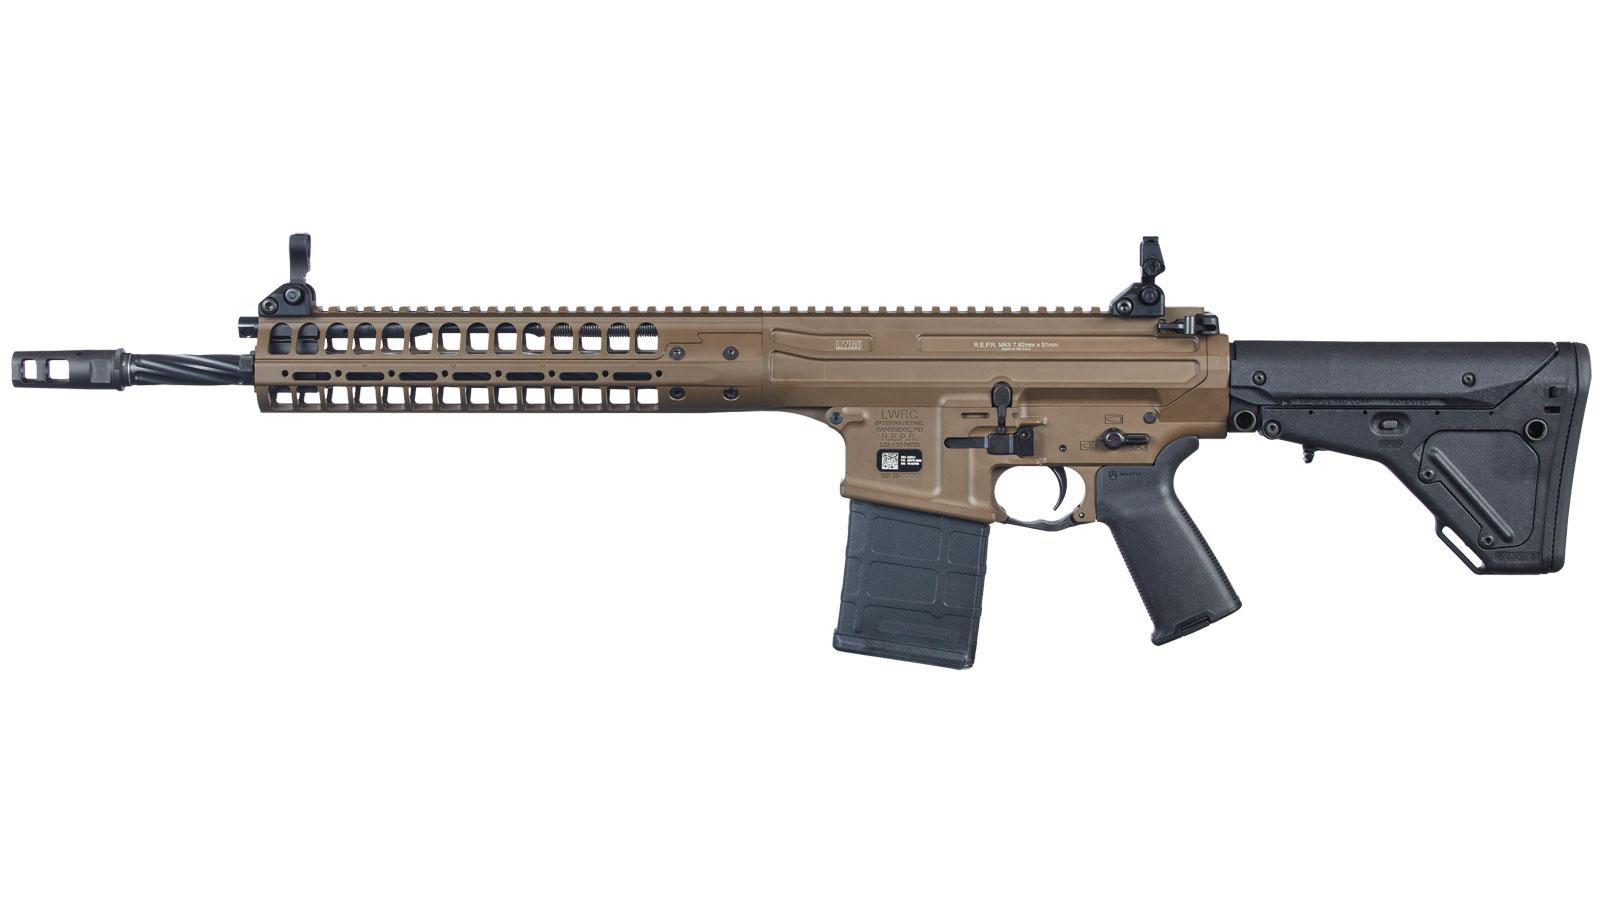 LWRC REPR MKII FDE 7.62 x 51mm| 308 Win 16-Inch 30Rd